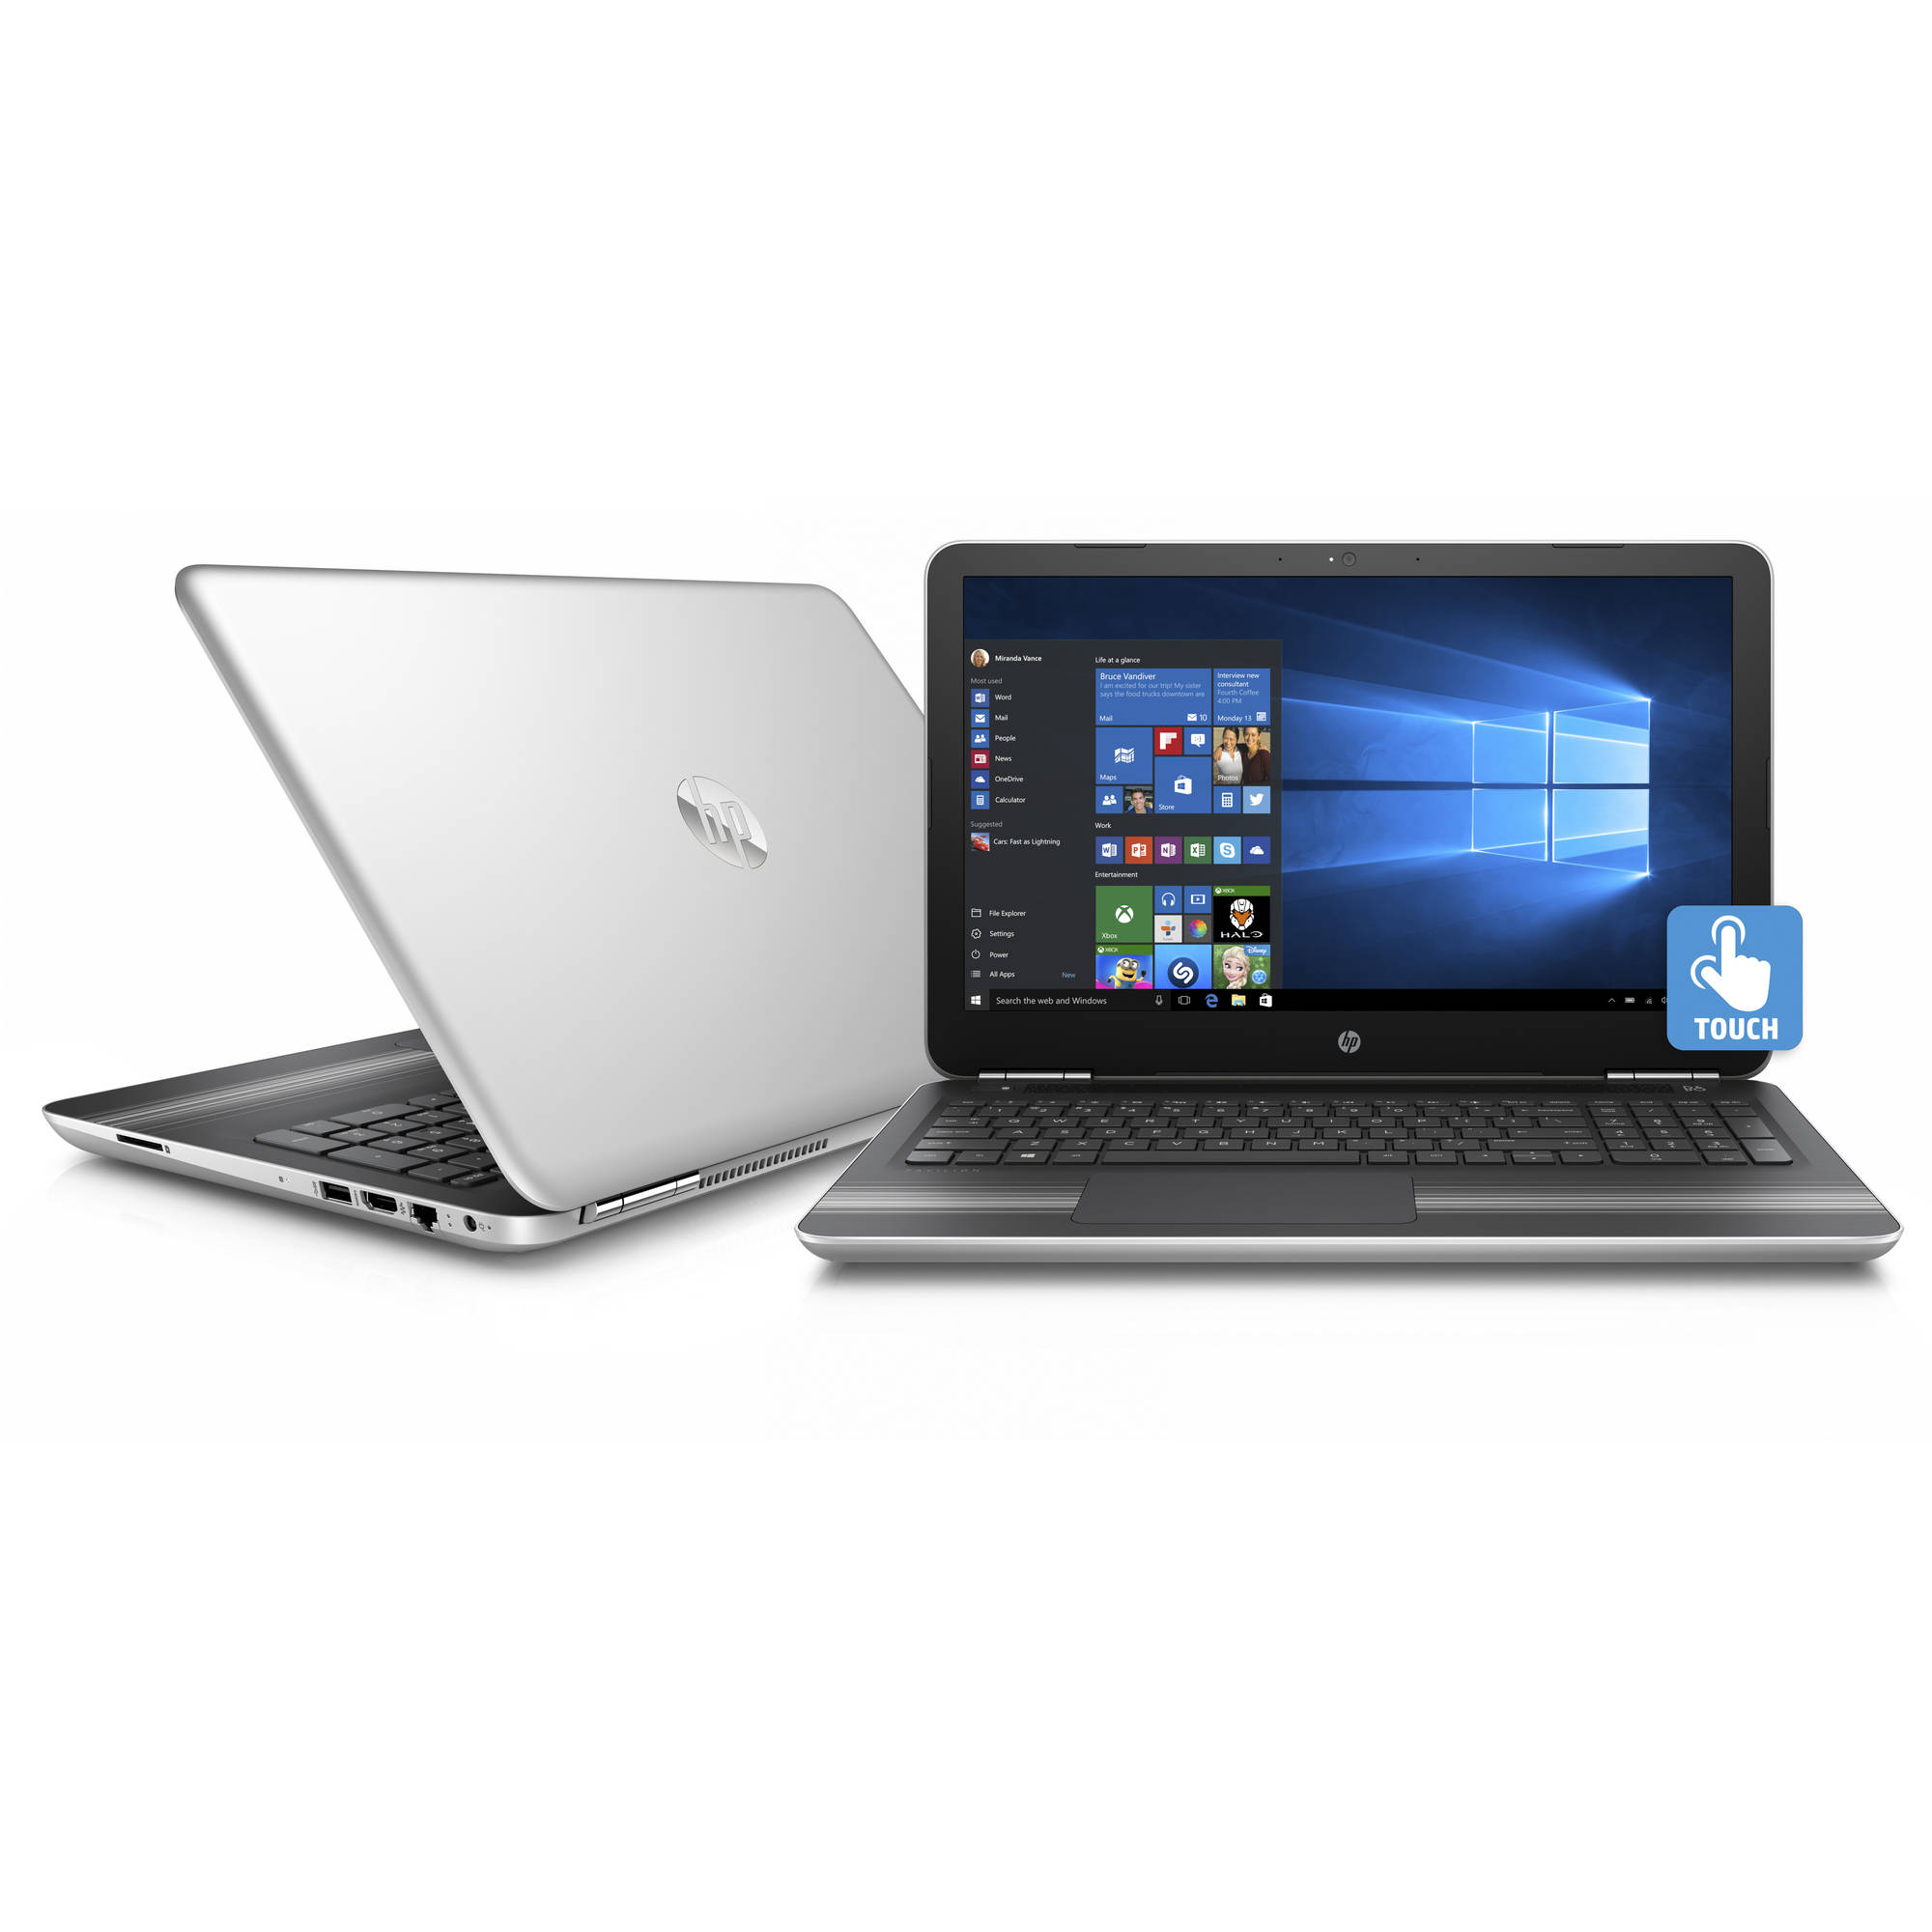 "HP Pavilion 15-au018wm 15.6"" Liquid Platinum Gaming Laptop, Touch Screen, Windows 10, Intel Core i7-6500U Processor, NVIDIAᅡᆴ GeForce 940MX Graphics, 12GB Memory, 1TB Hard Drive"